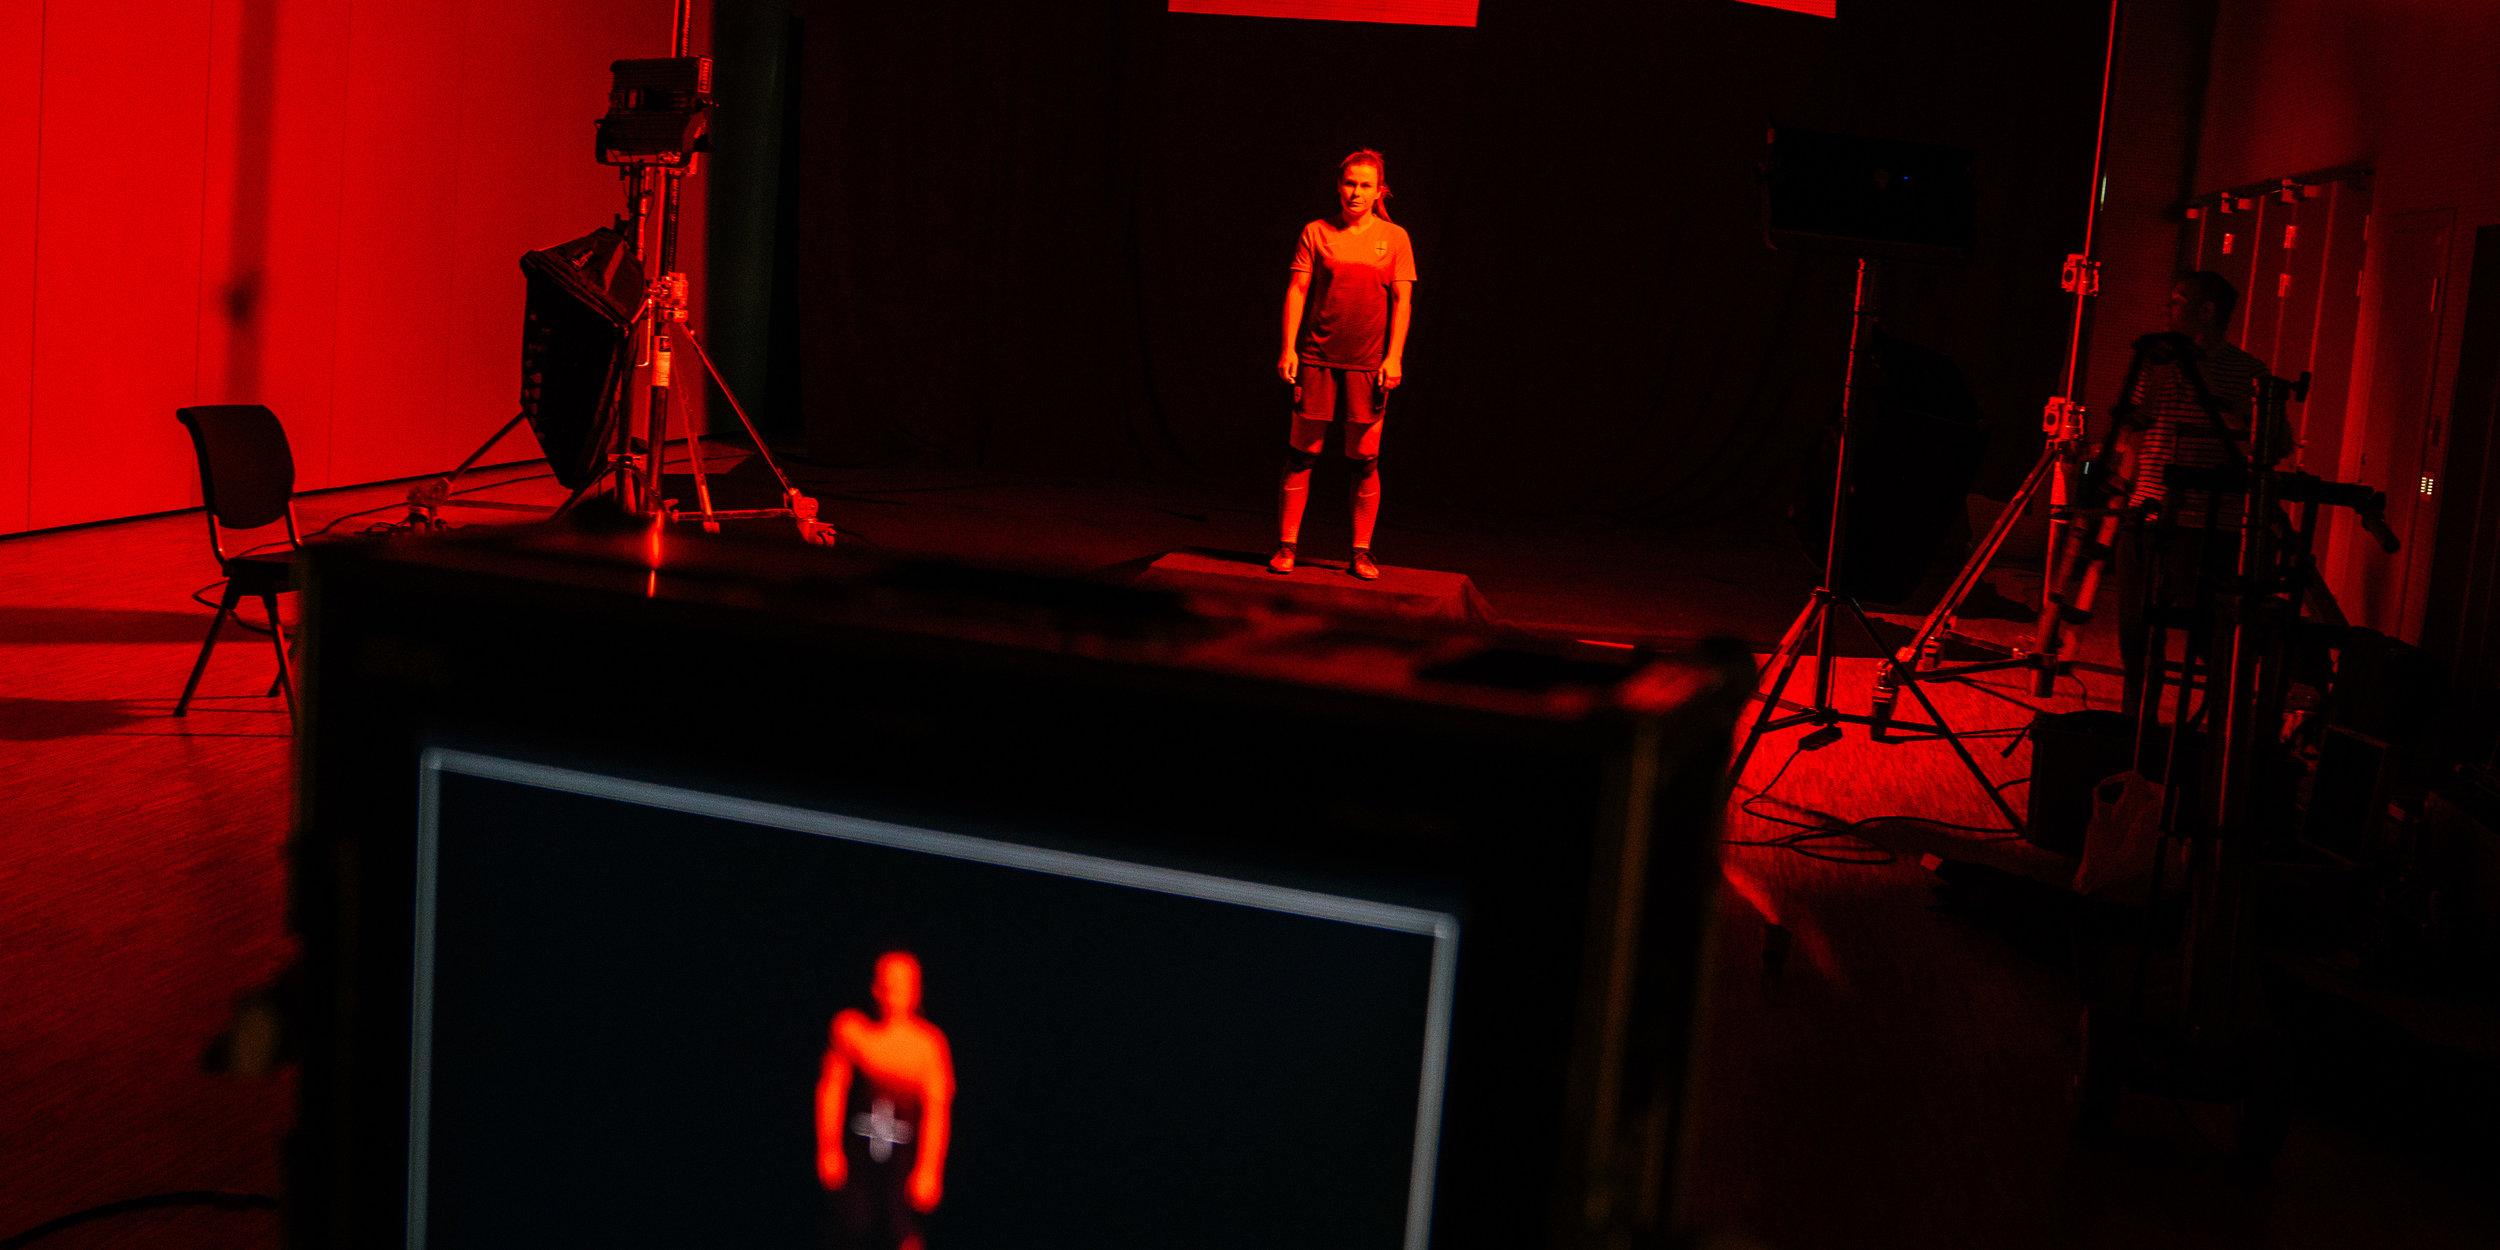 Nike Shoot-4.jpg